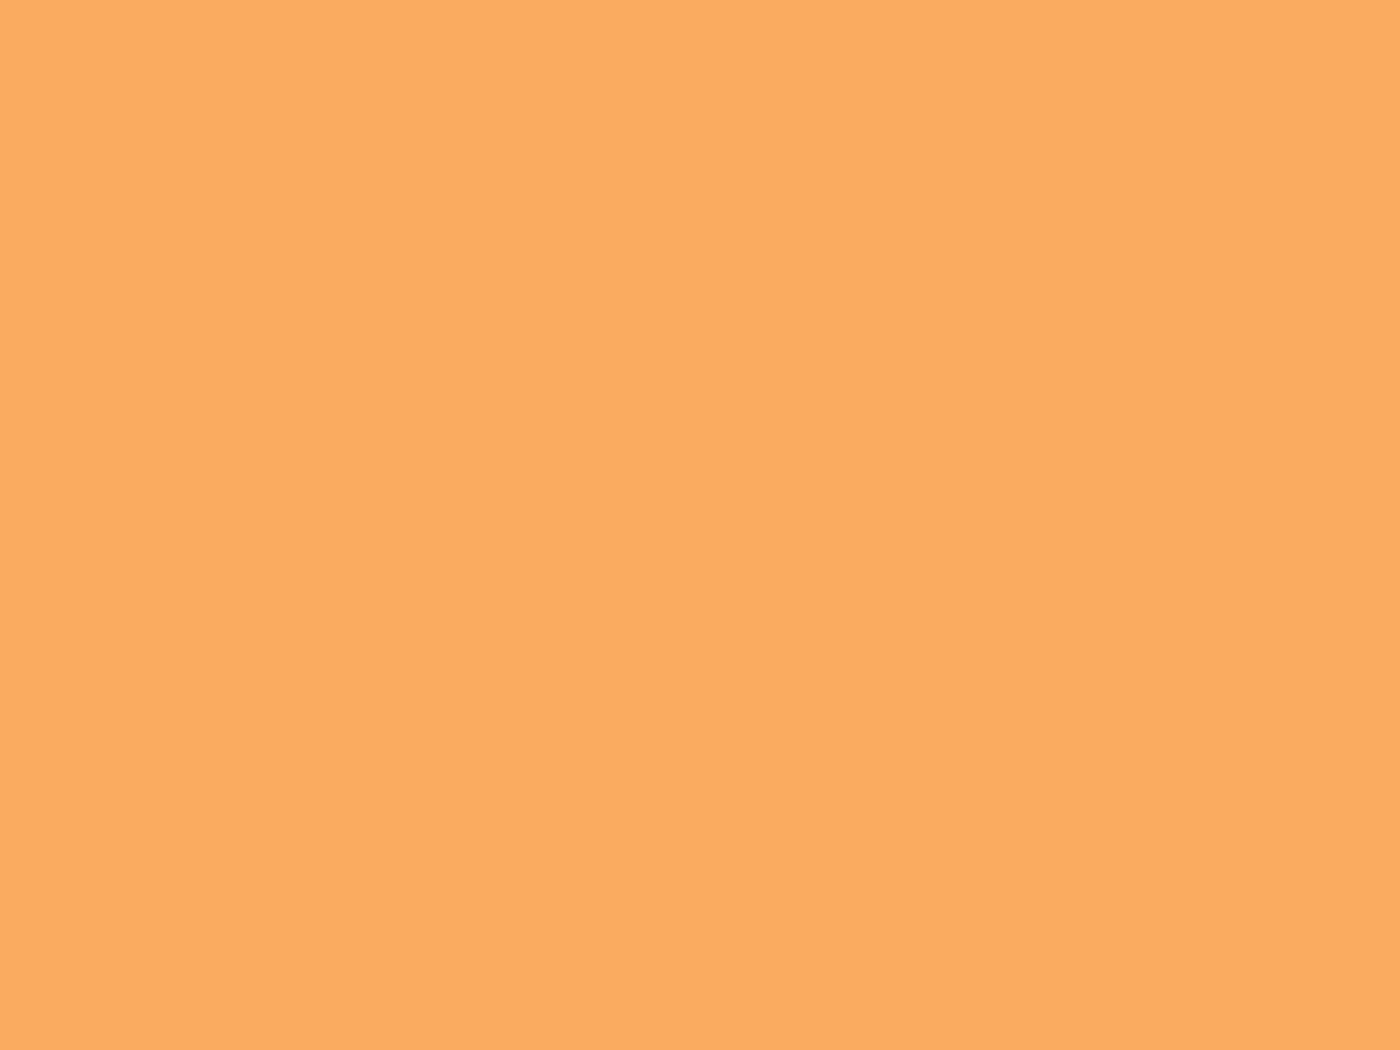 1400x1050 Rajah Solid Color Background